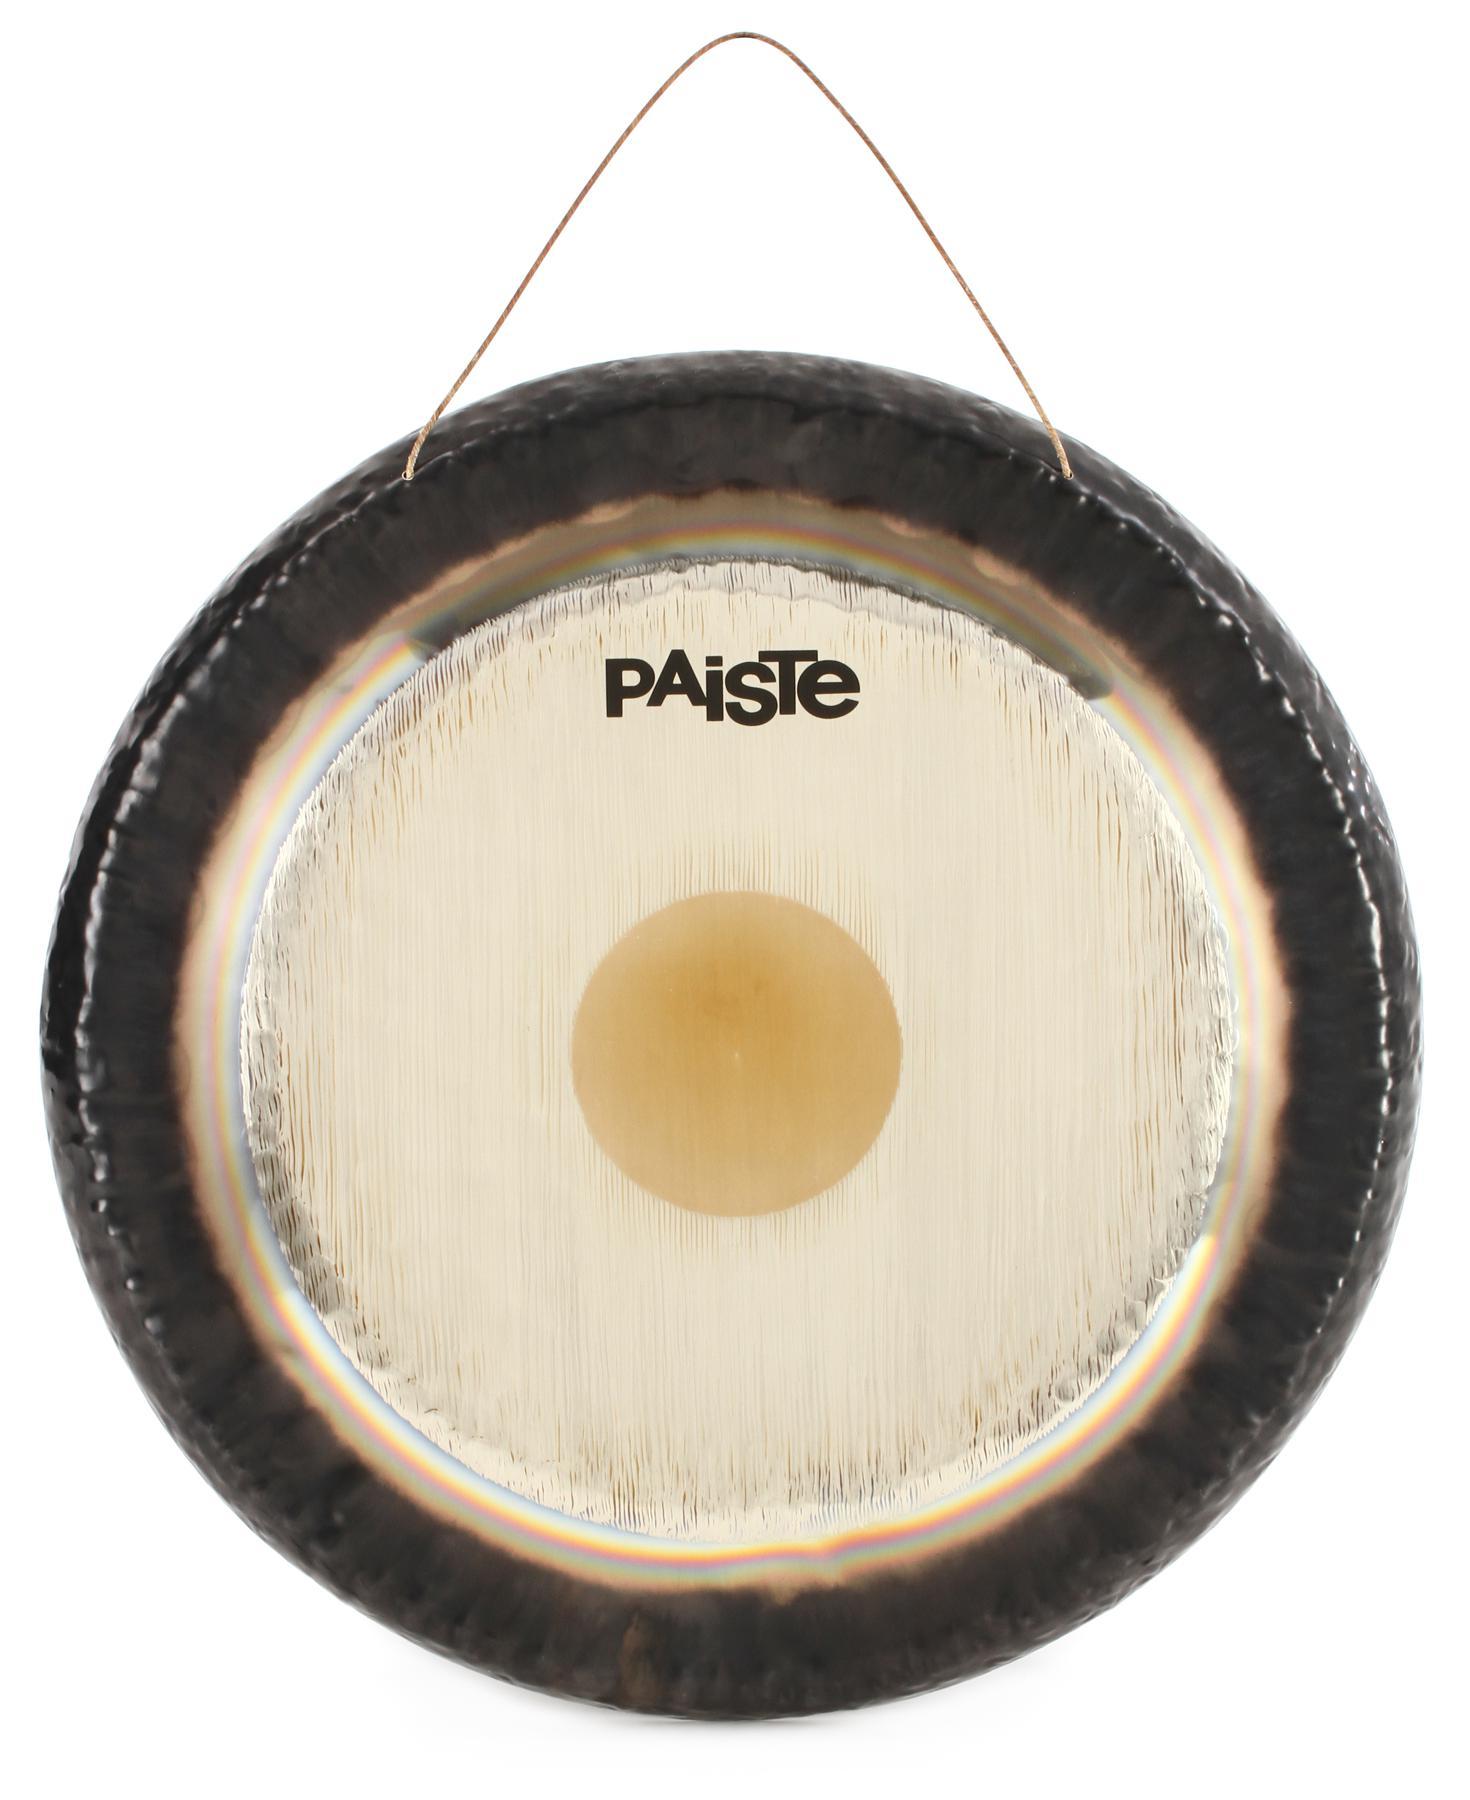 "3. Paiste SG15032 32"" Symphonic Gong"